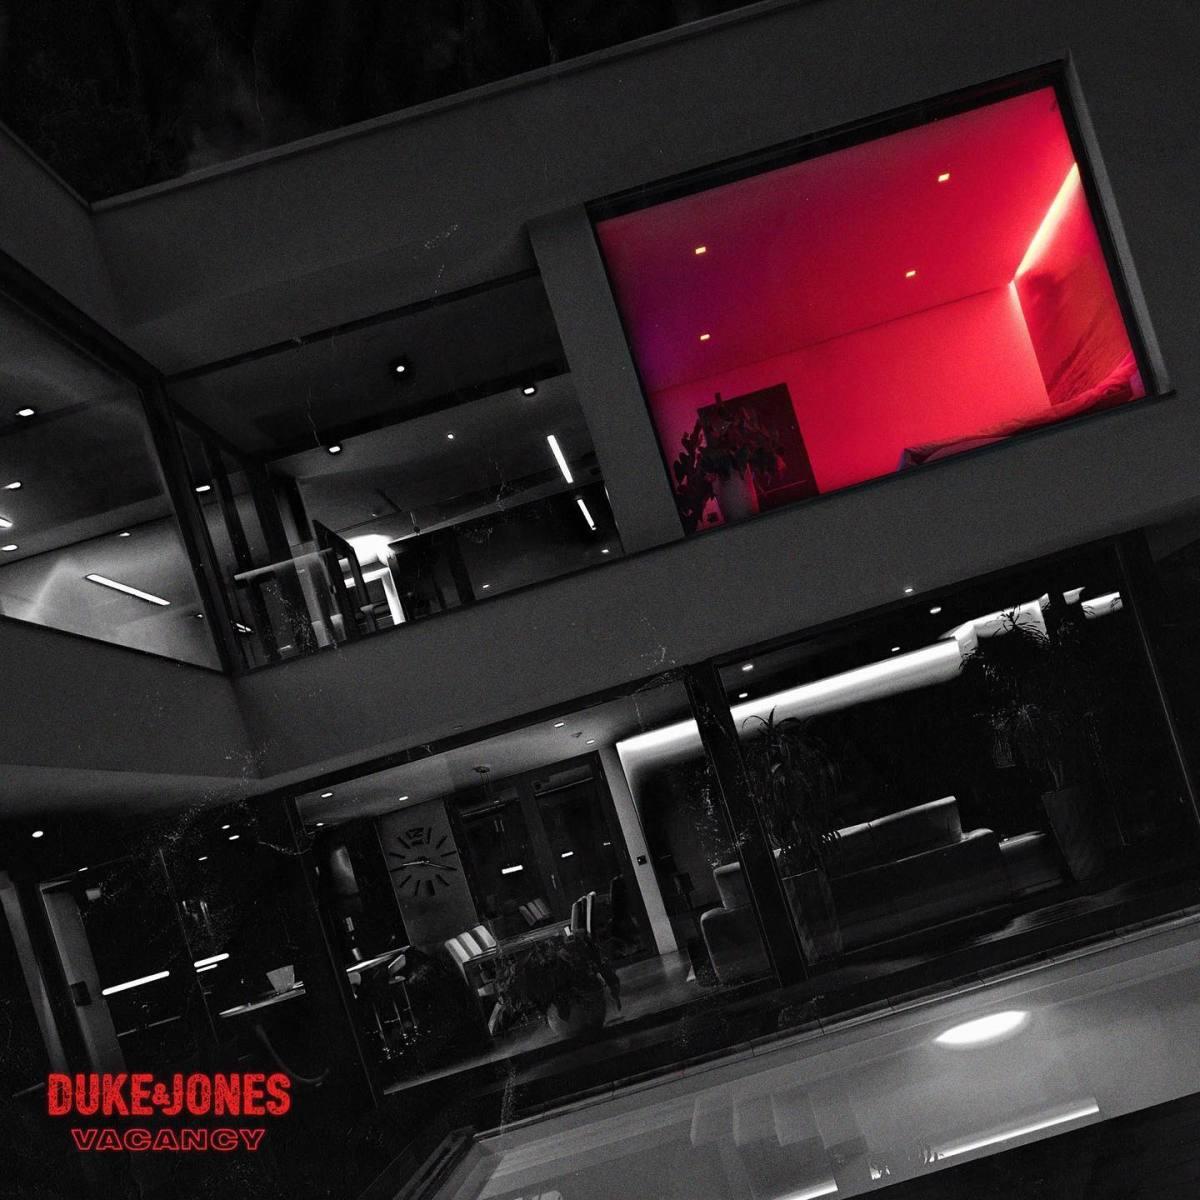 Duke & Jones - Vacancy (Album Cover Artwork)